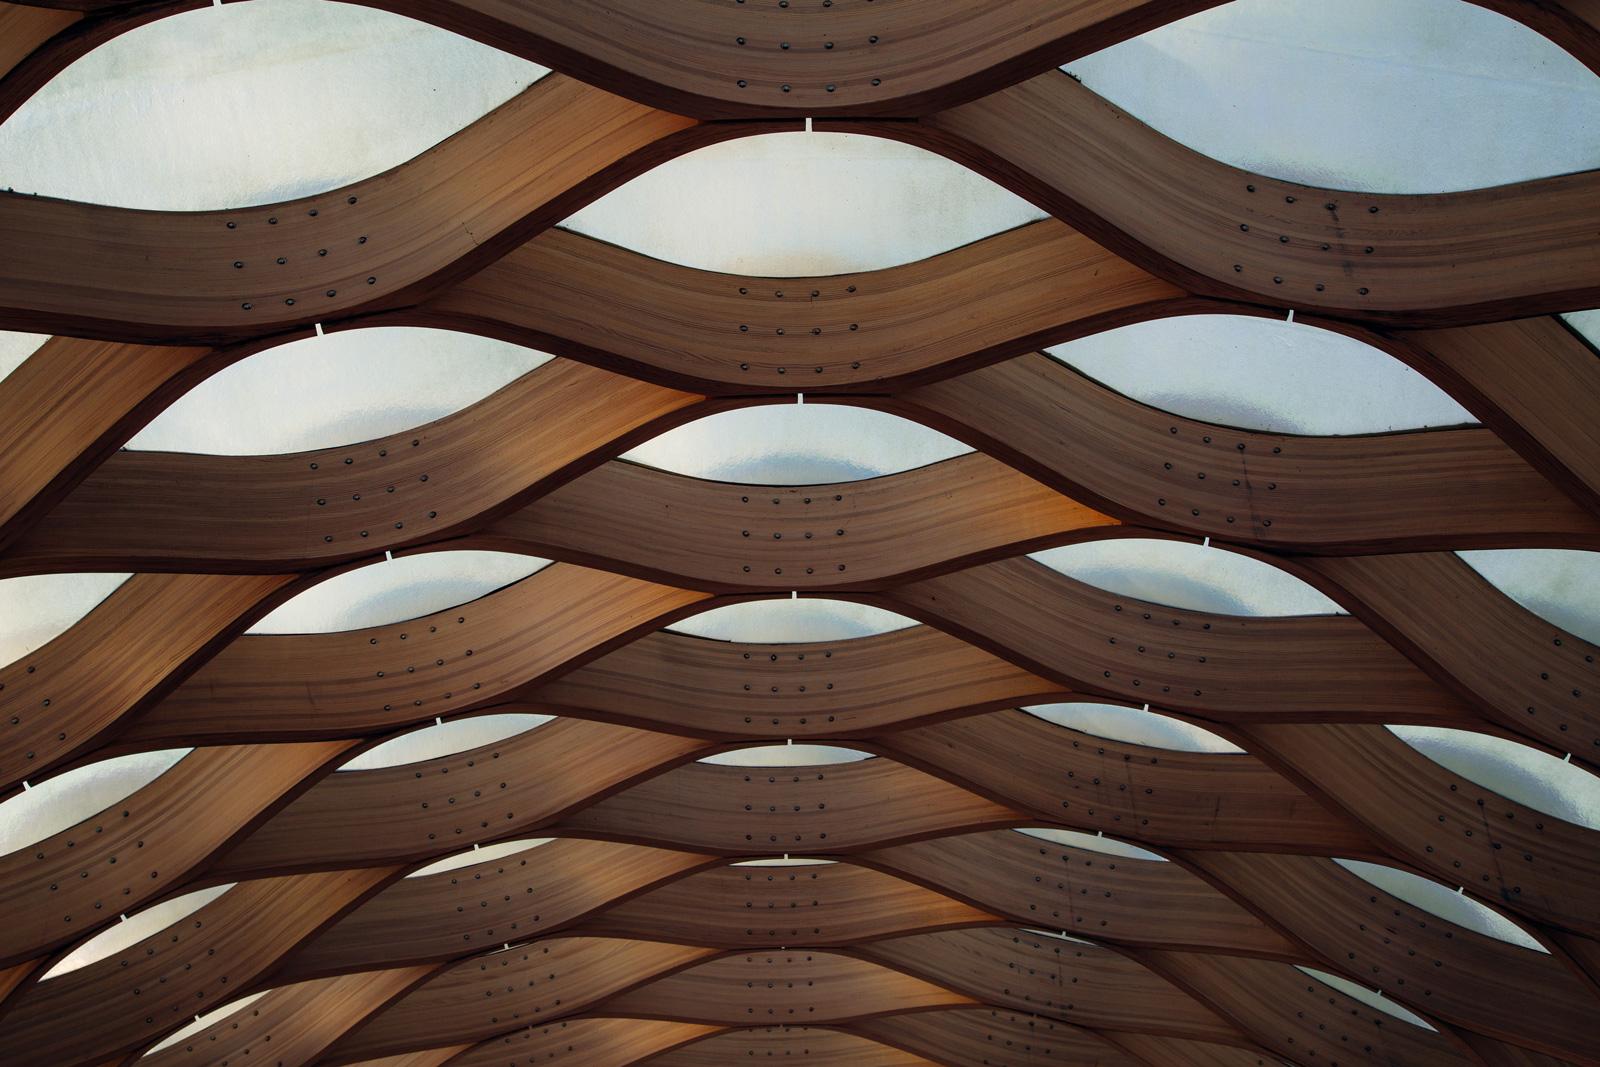 Architectural detail in Chicago